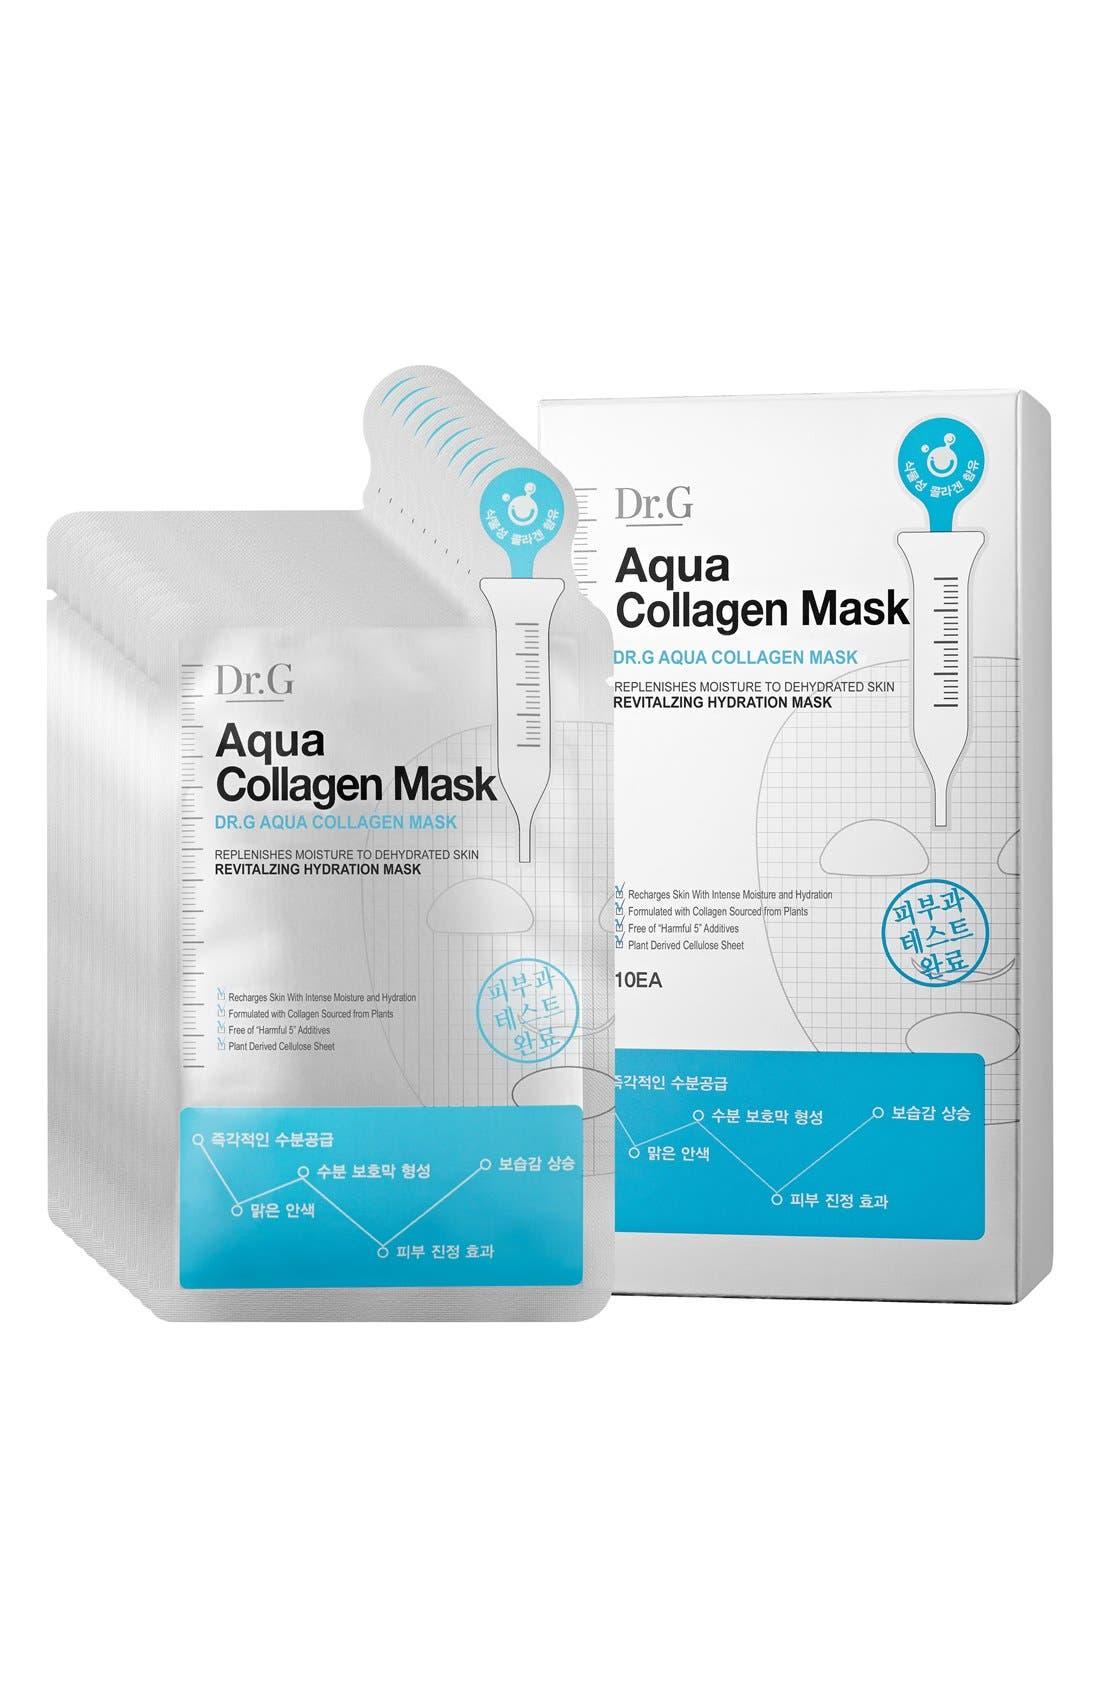 My Skin Mentor Dr. G Beauty Aqua Collagen Mask